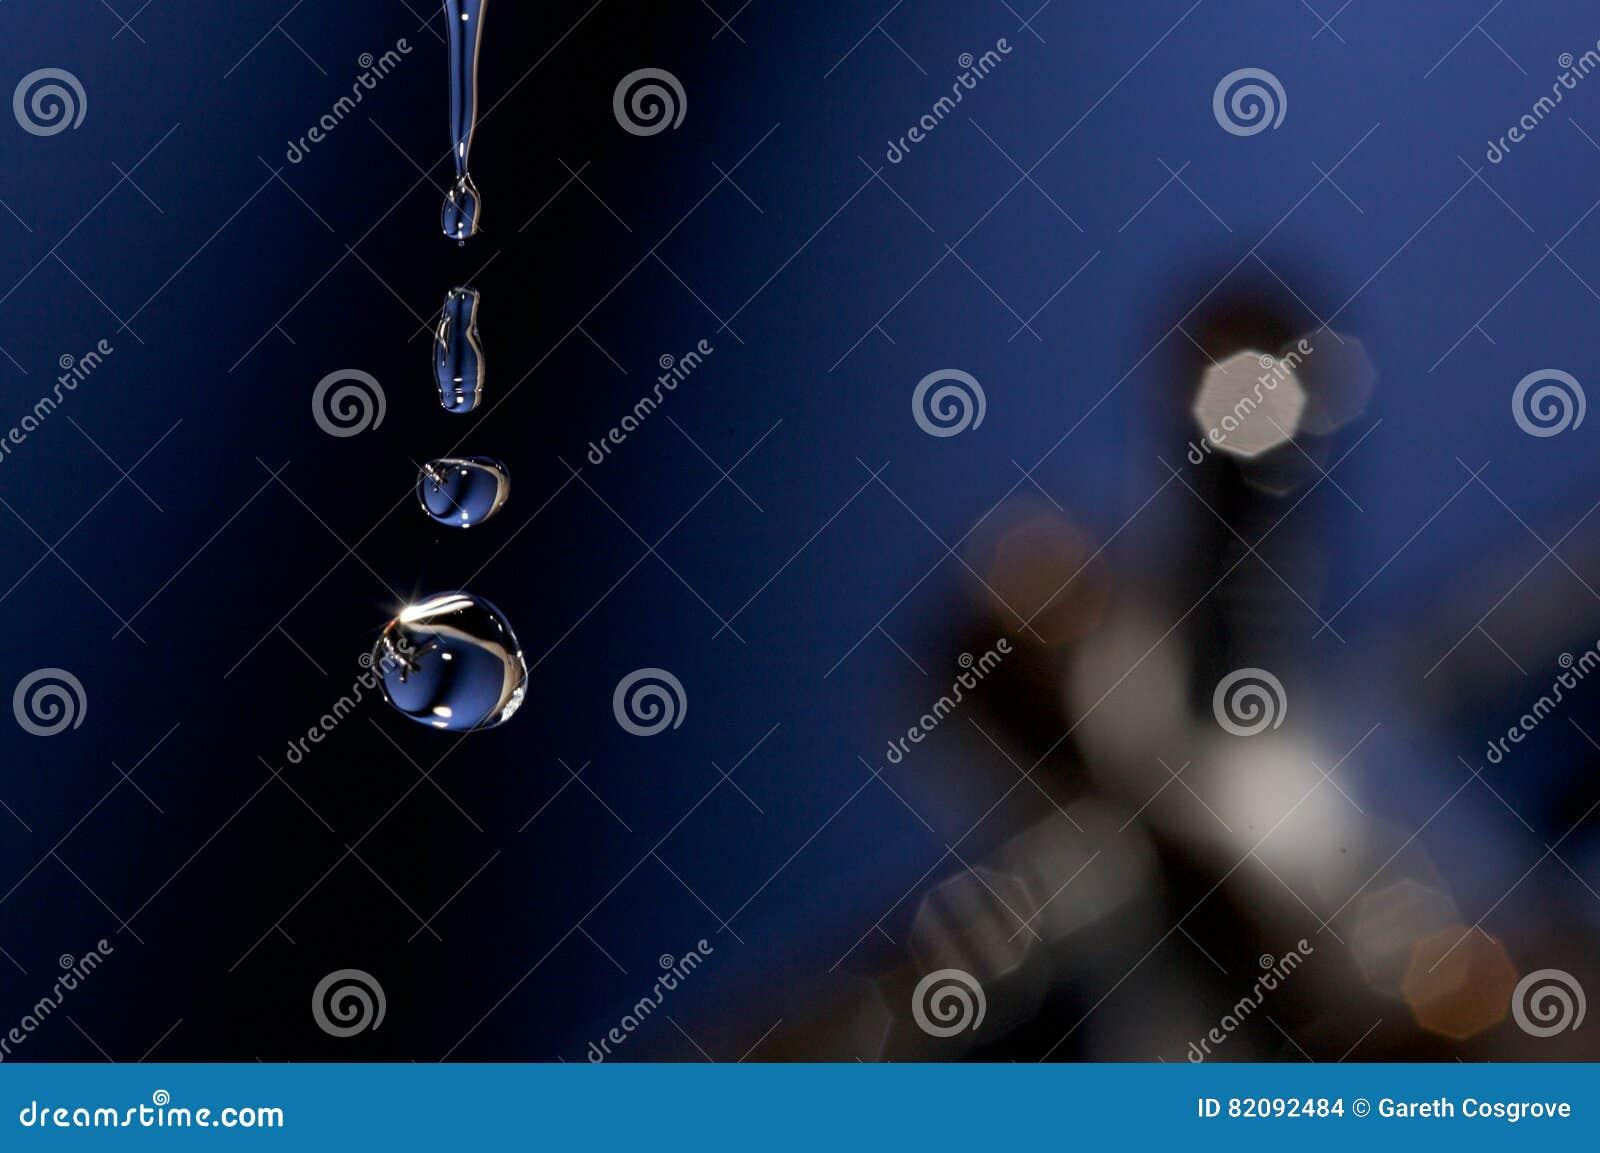 Close up of water drops